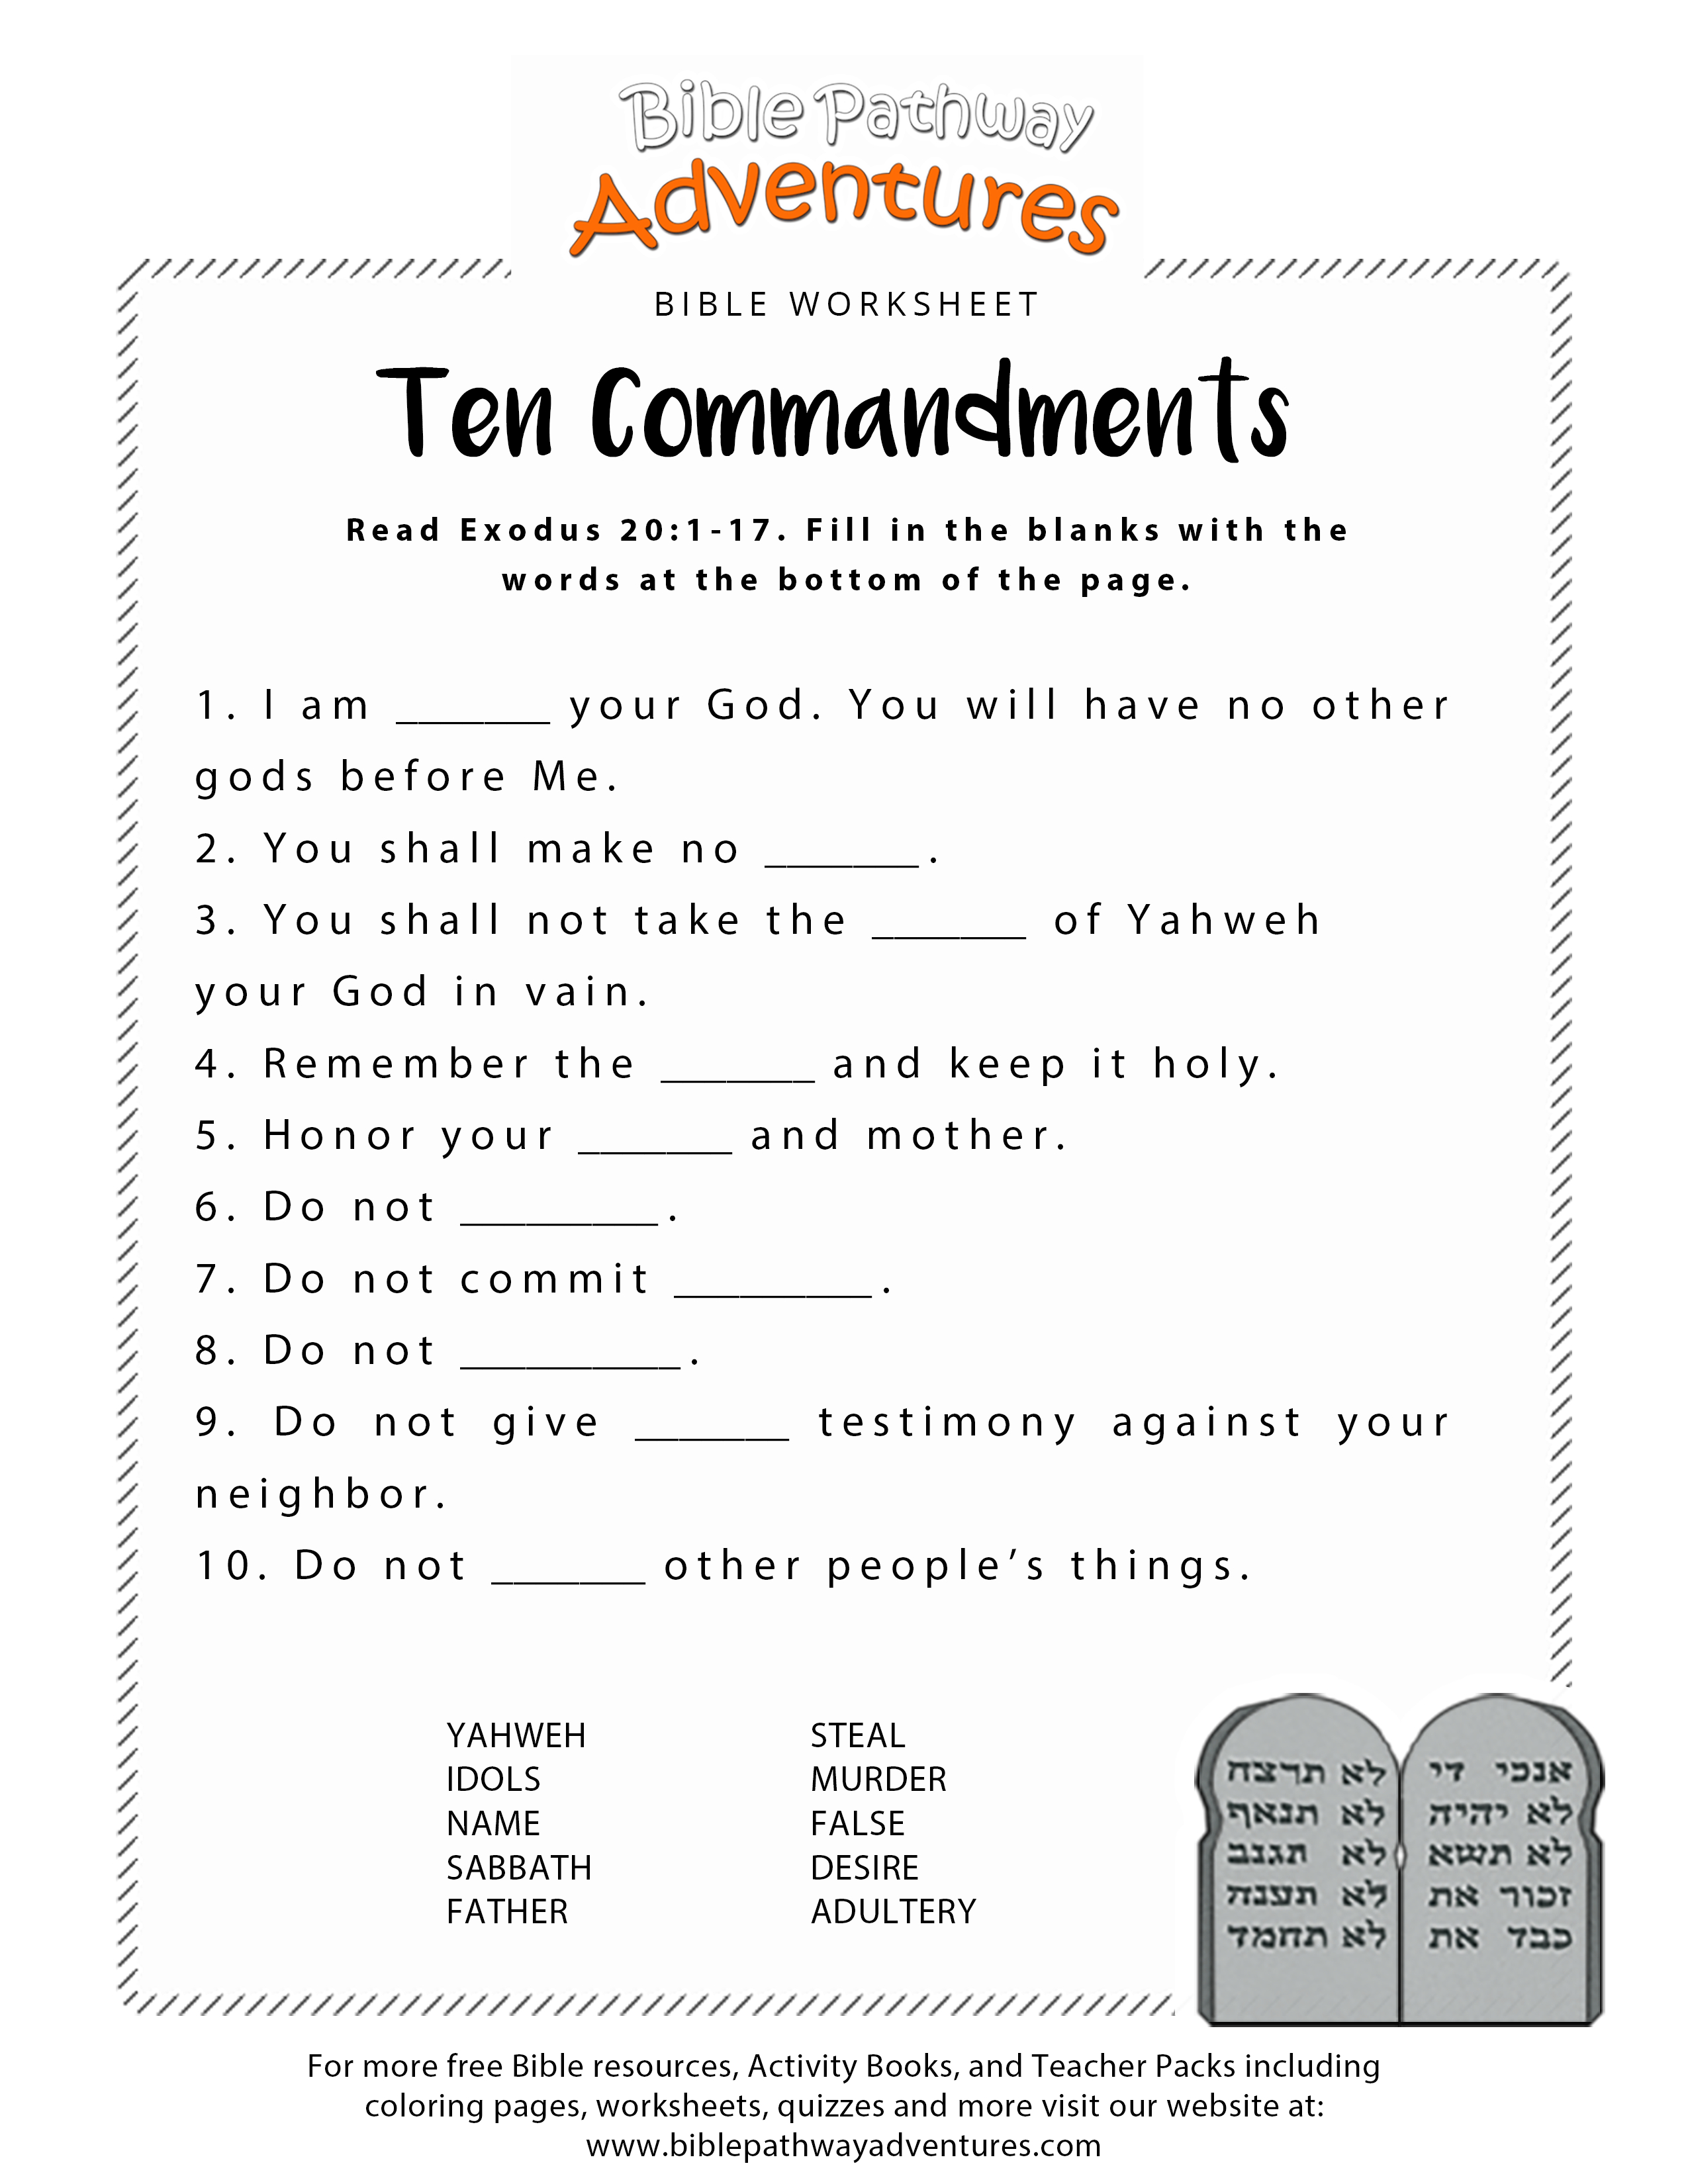 Ten Commandments Worksheet For Kids | Junior Church | Bible Lessons | 10 Commandments Printable Worksheets